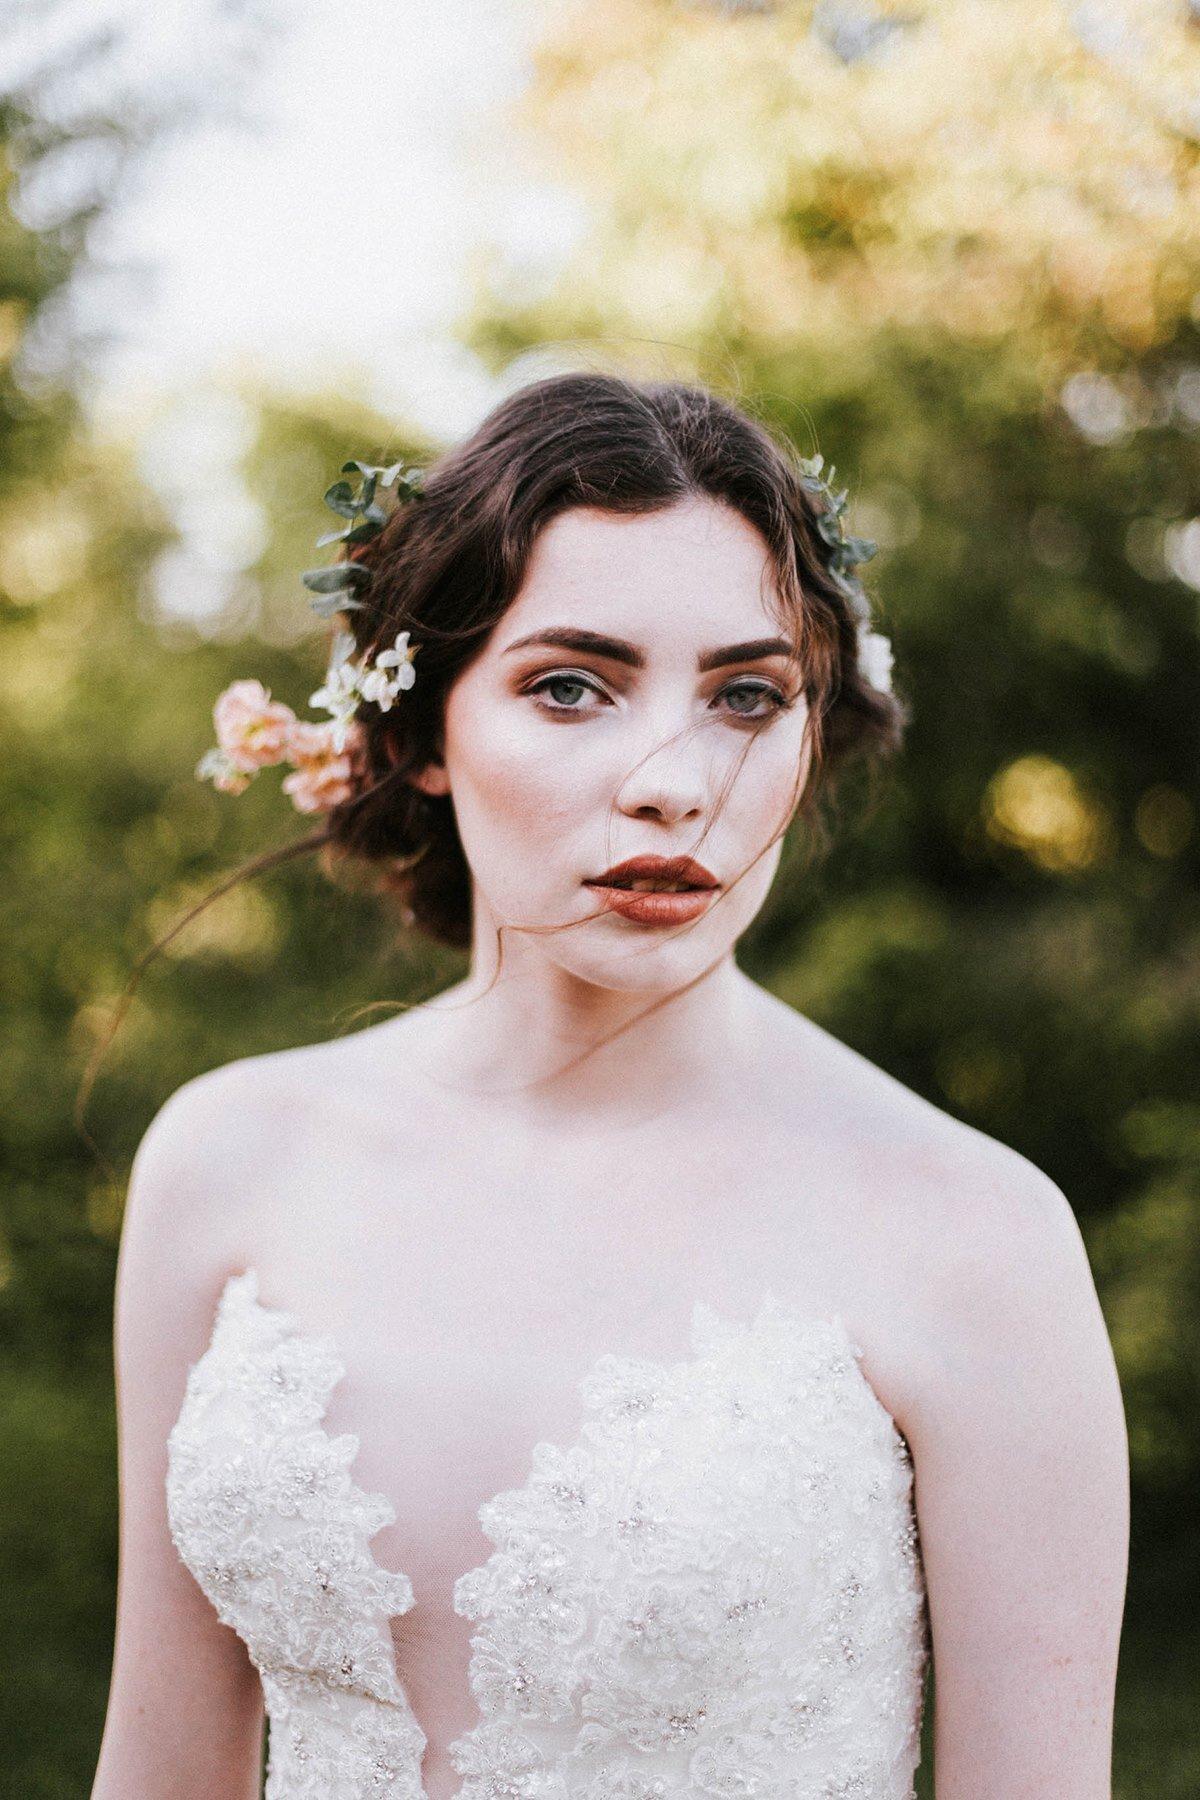 Photographer: Brooke Townsend Model: Alexis Fabish